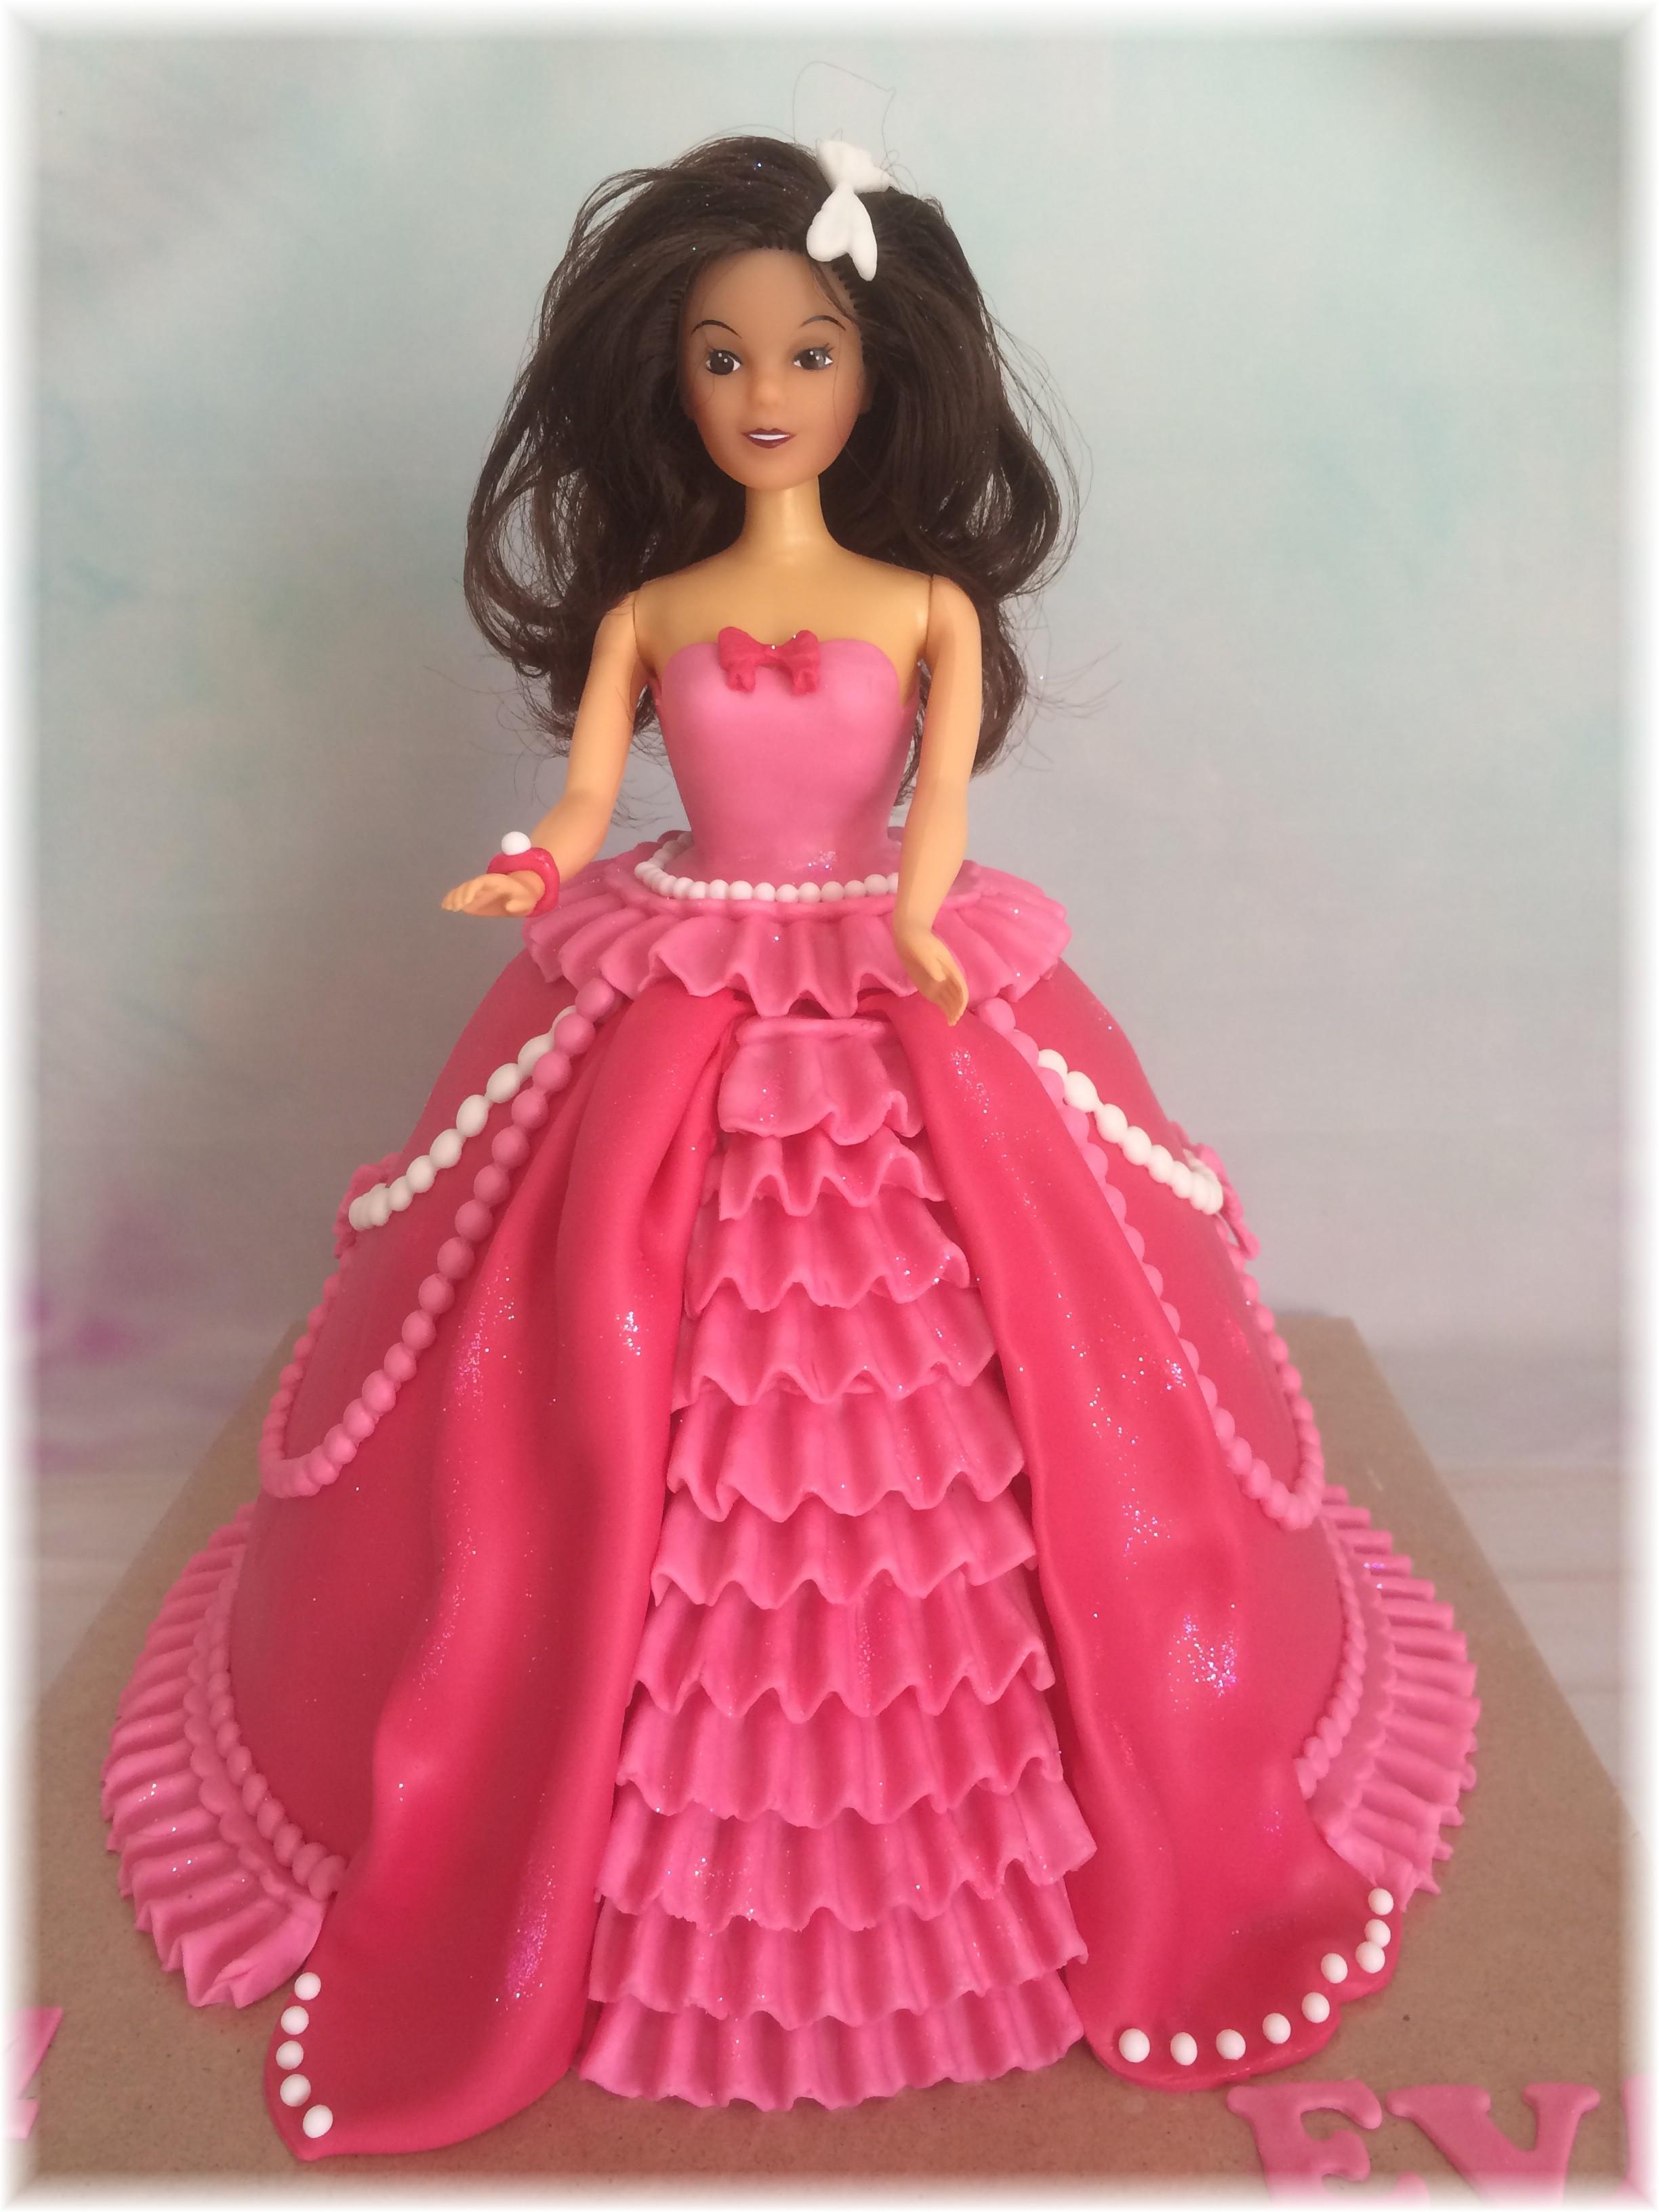 barbie taart 3D Barbie Taart   MjamTaart barbie taart